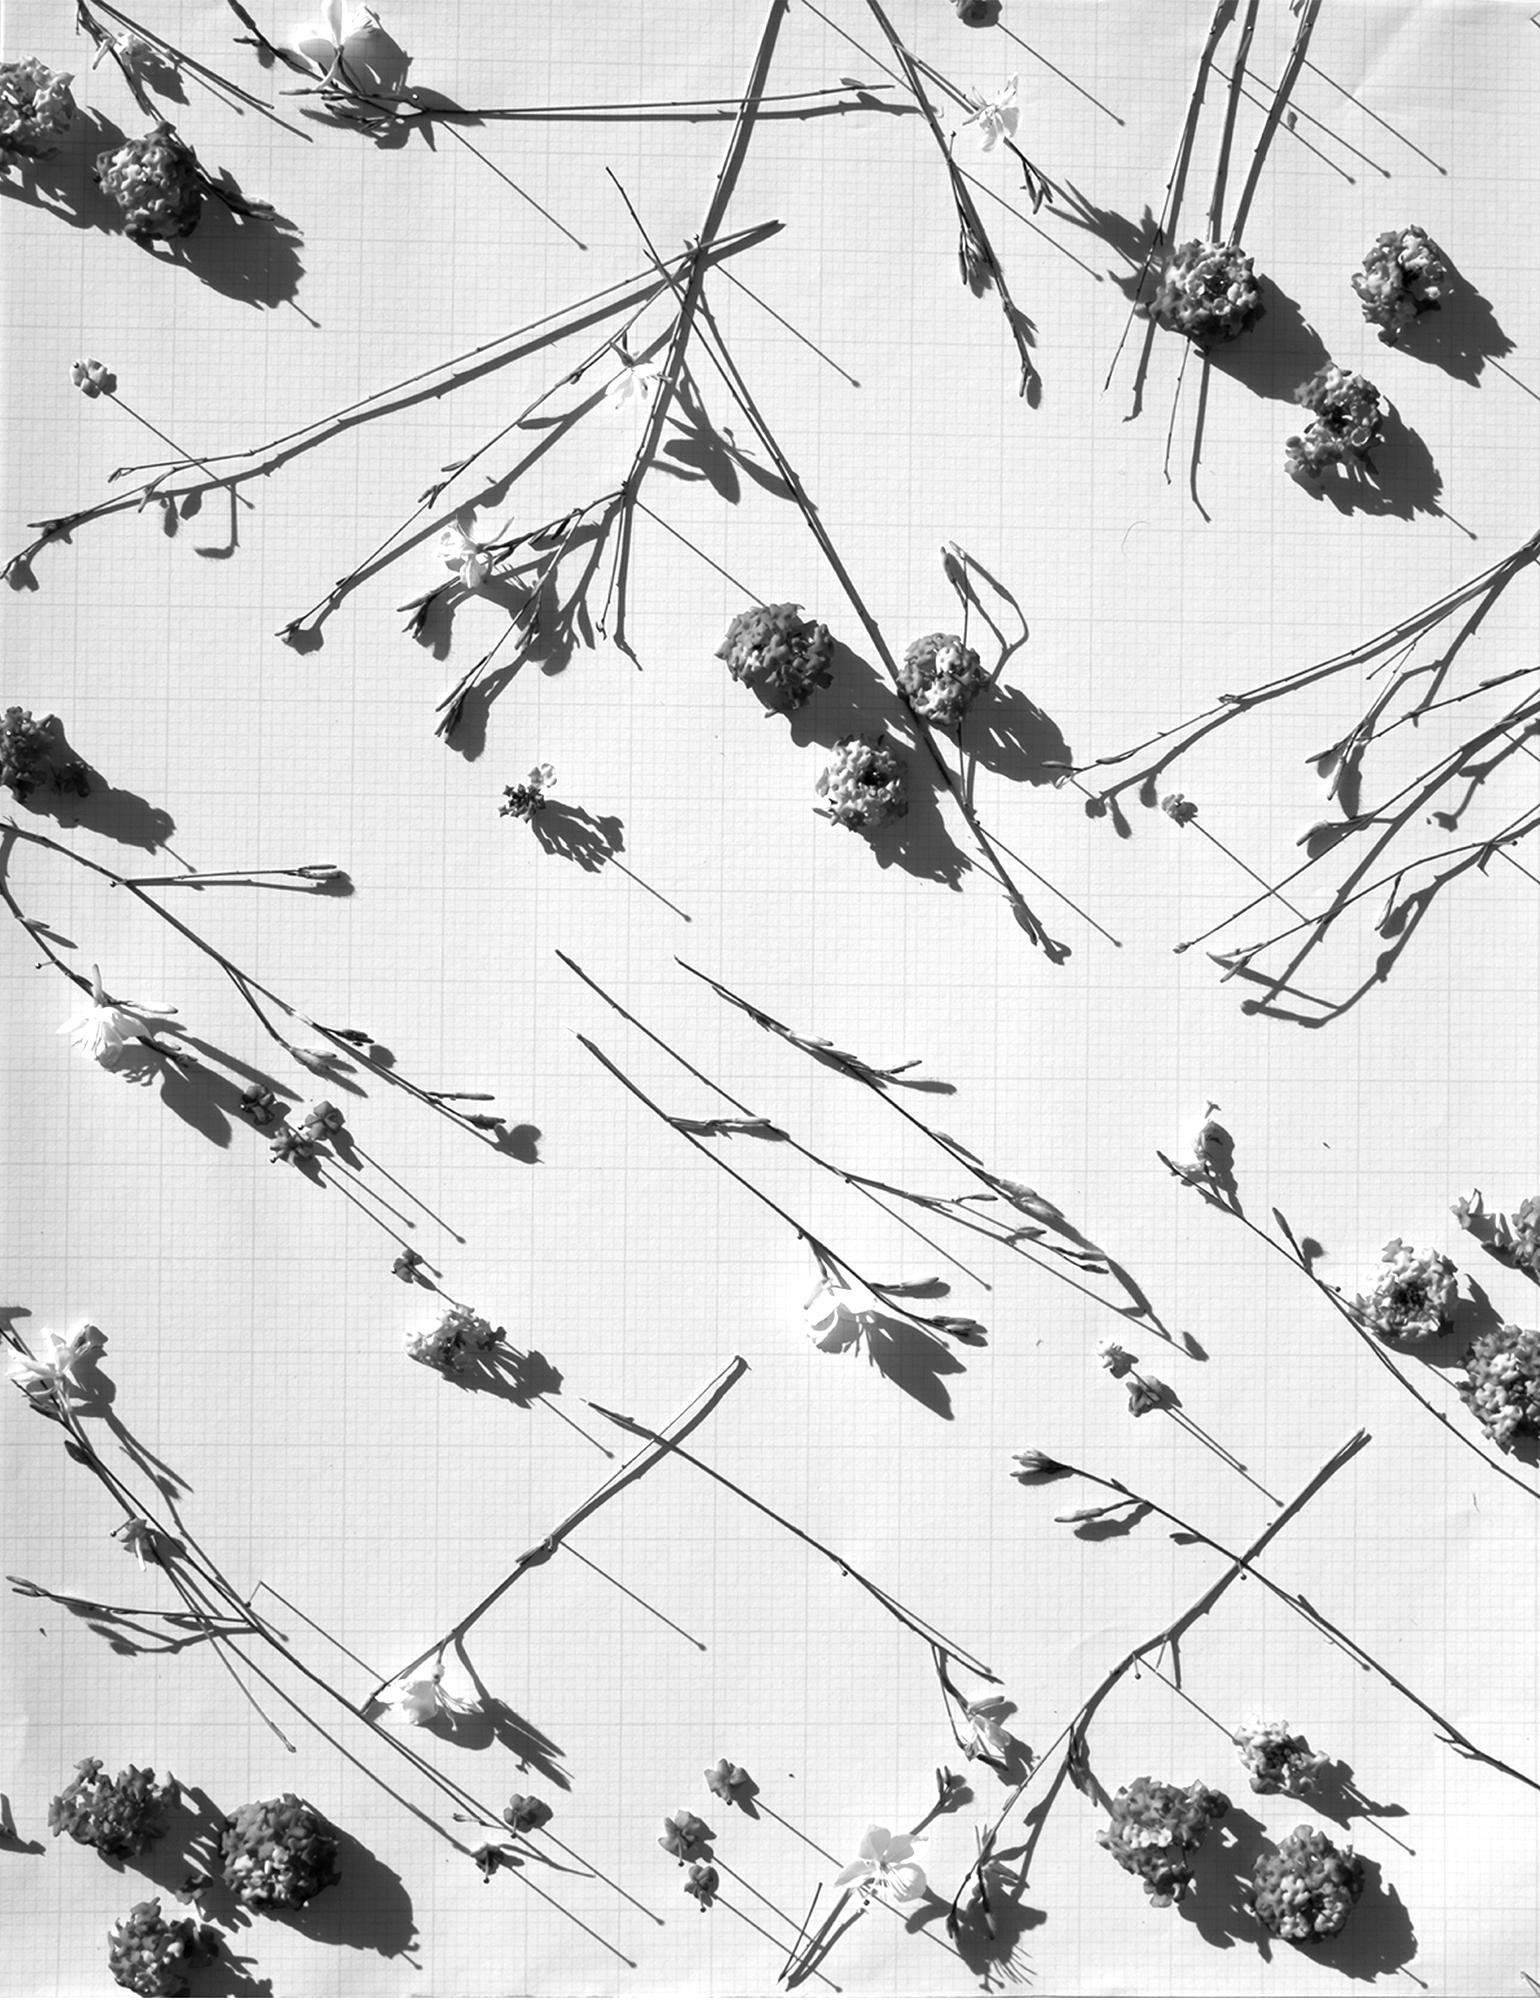 Drought Tolerant #1, Archival Pigment Print